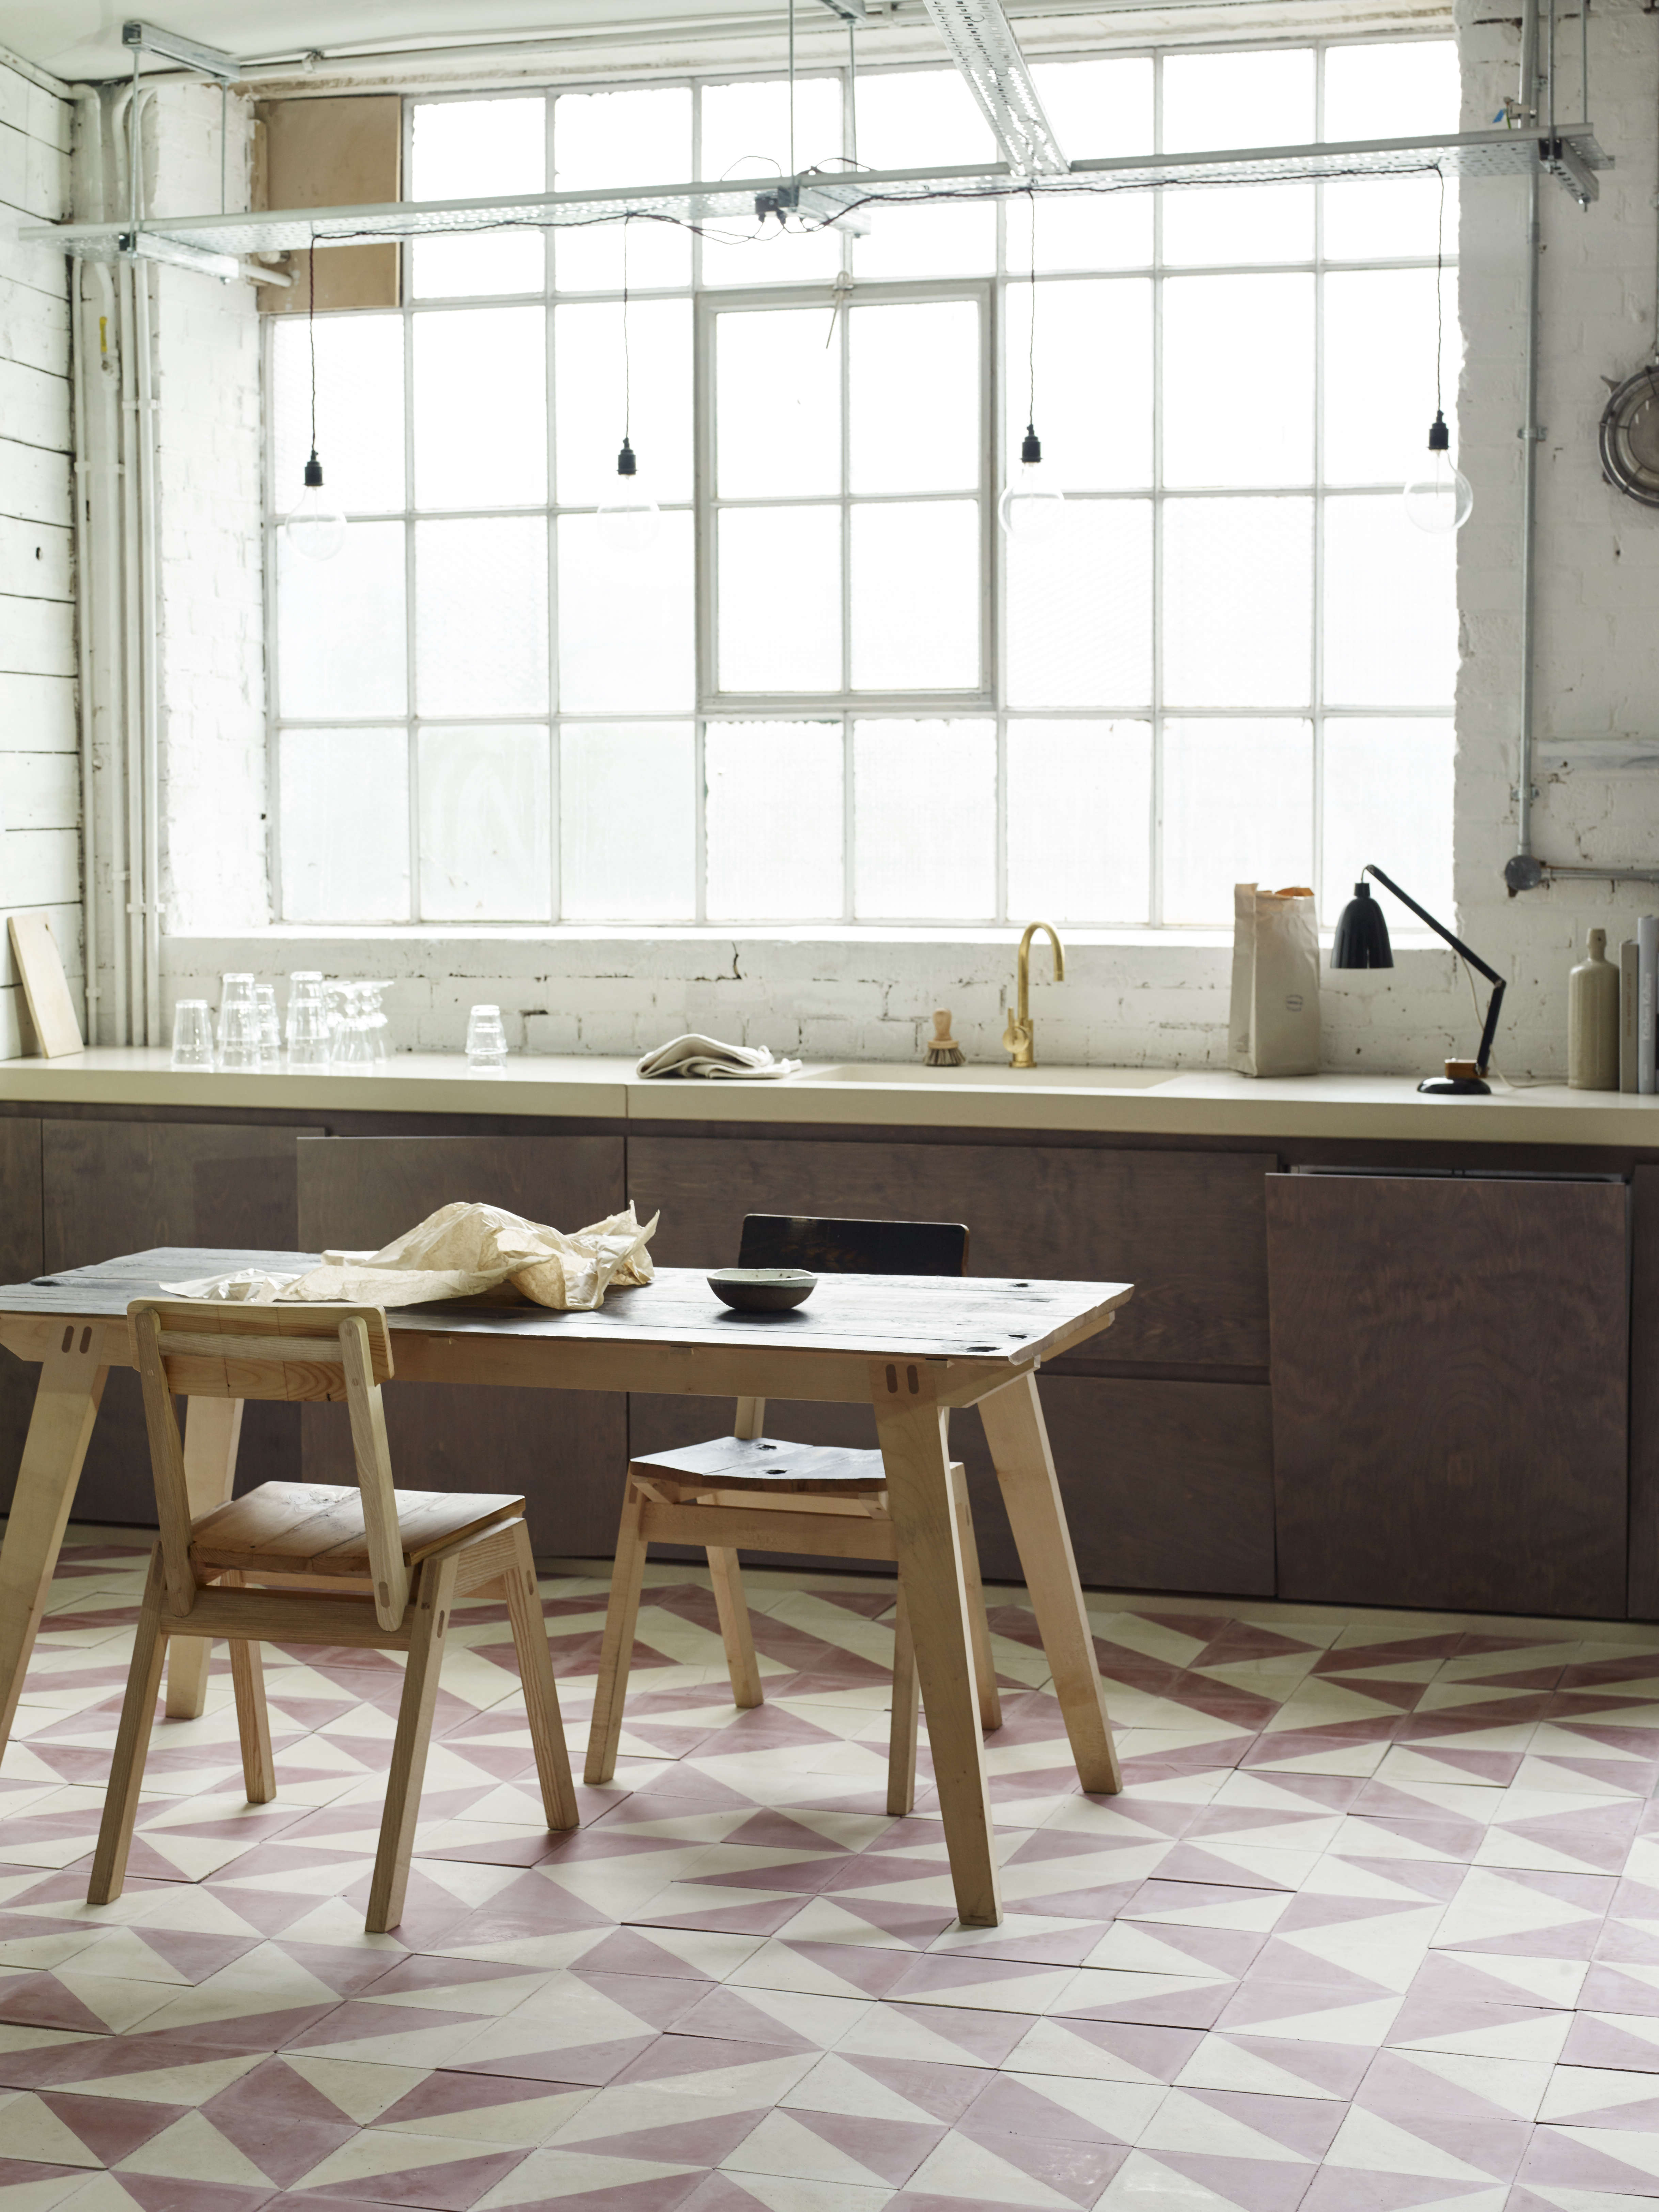 bert and may showroom kitchen 10